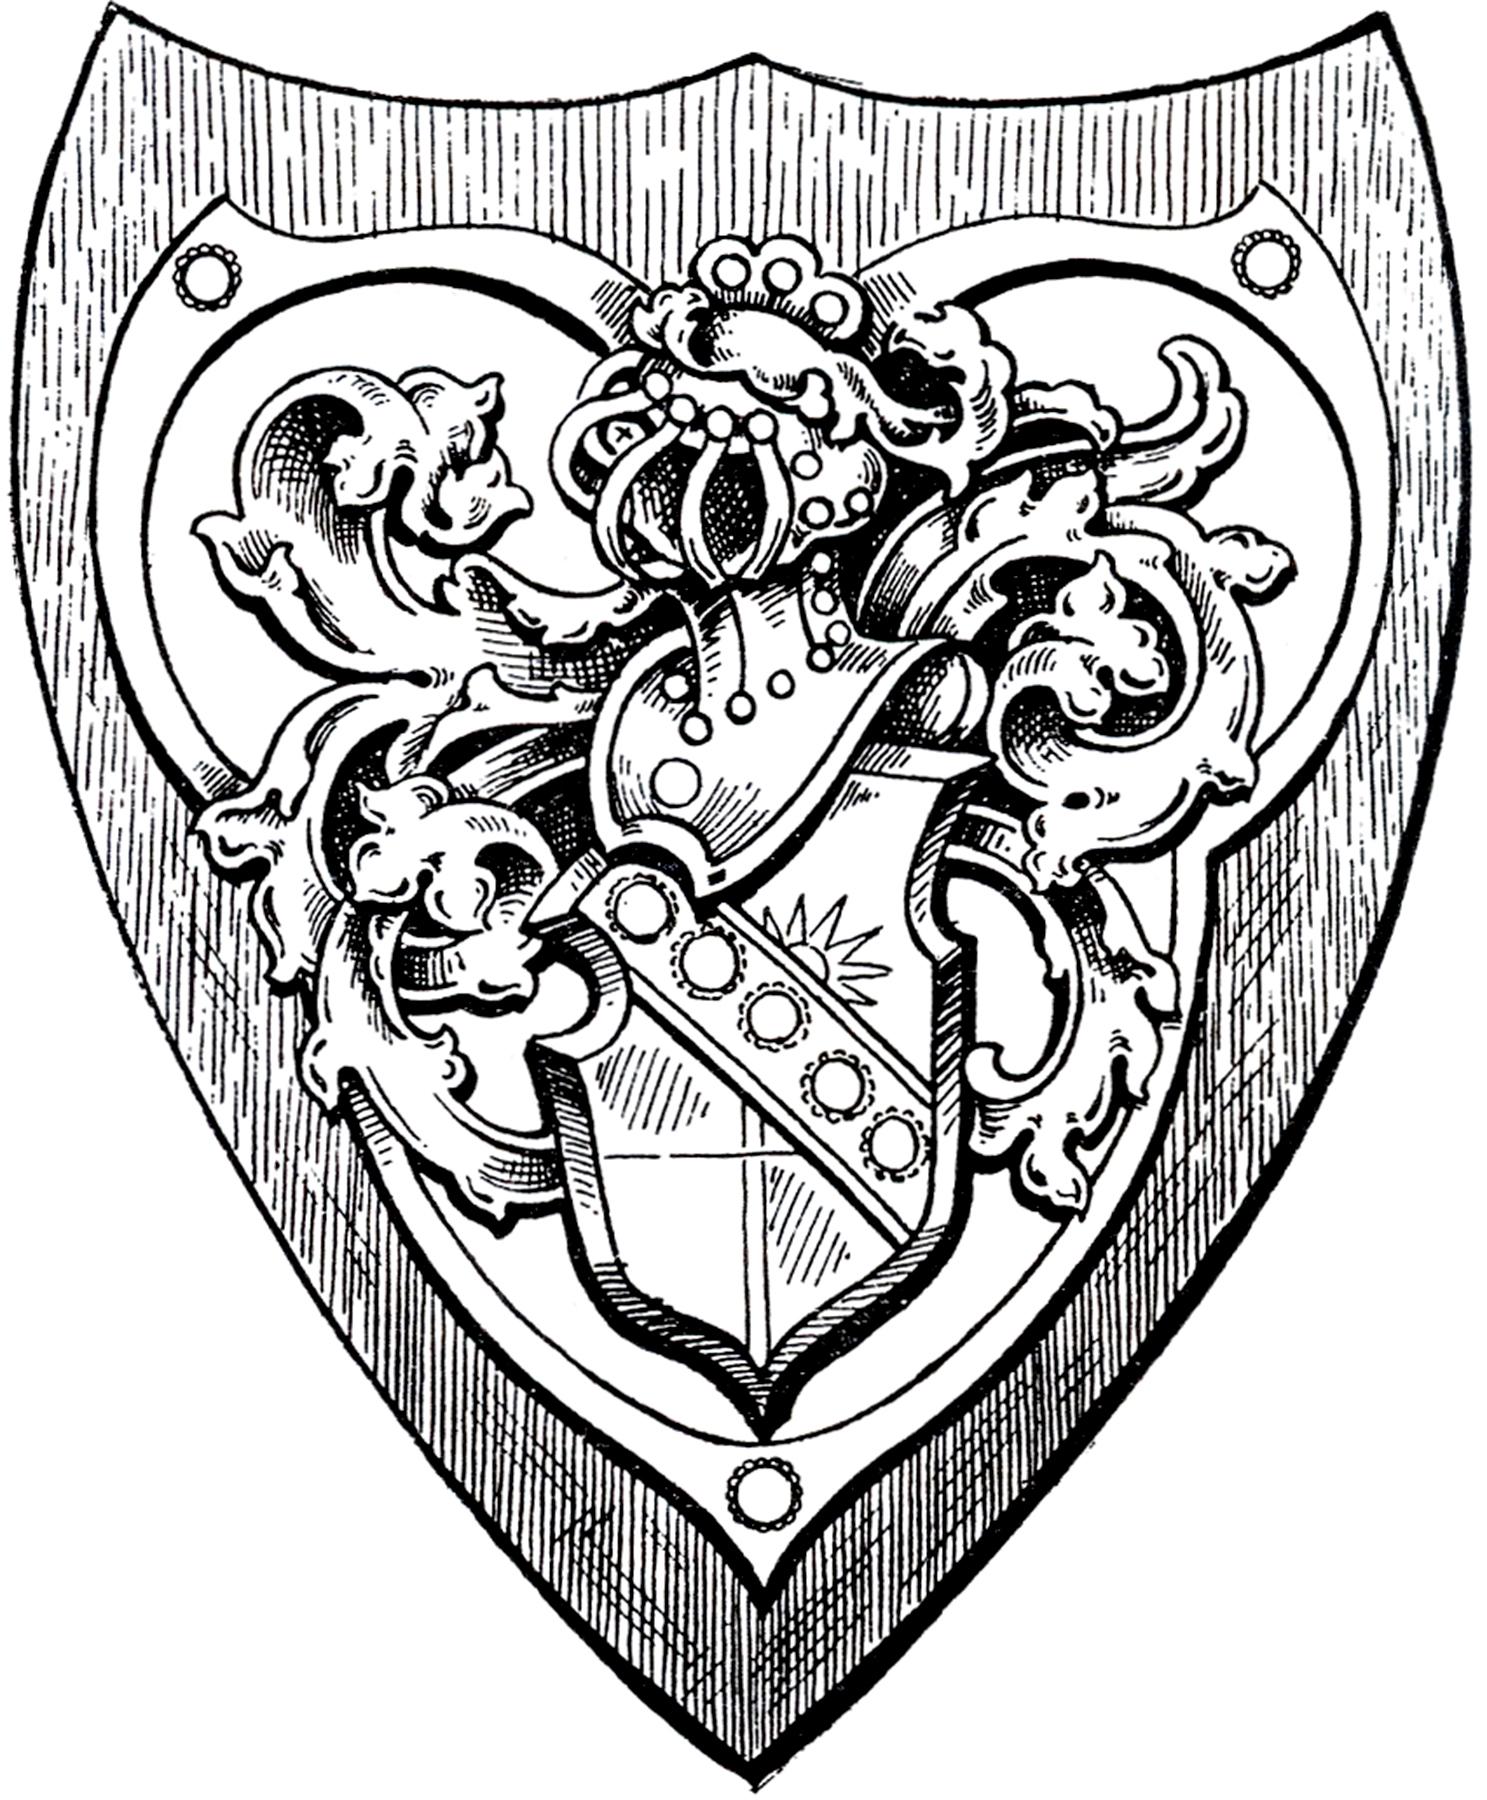 Vintage Shield Armor Image